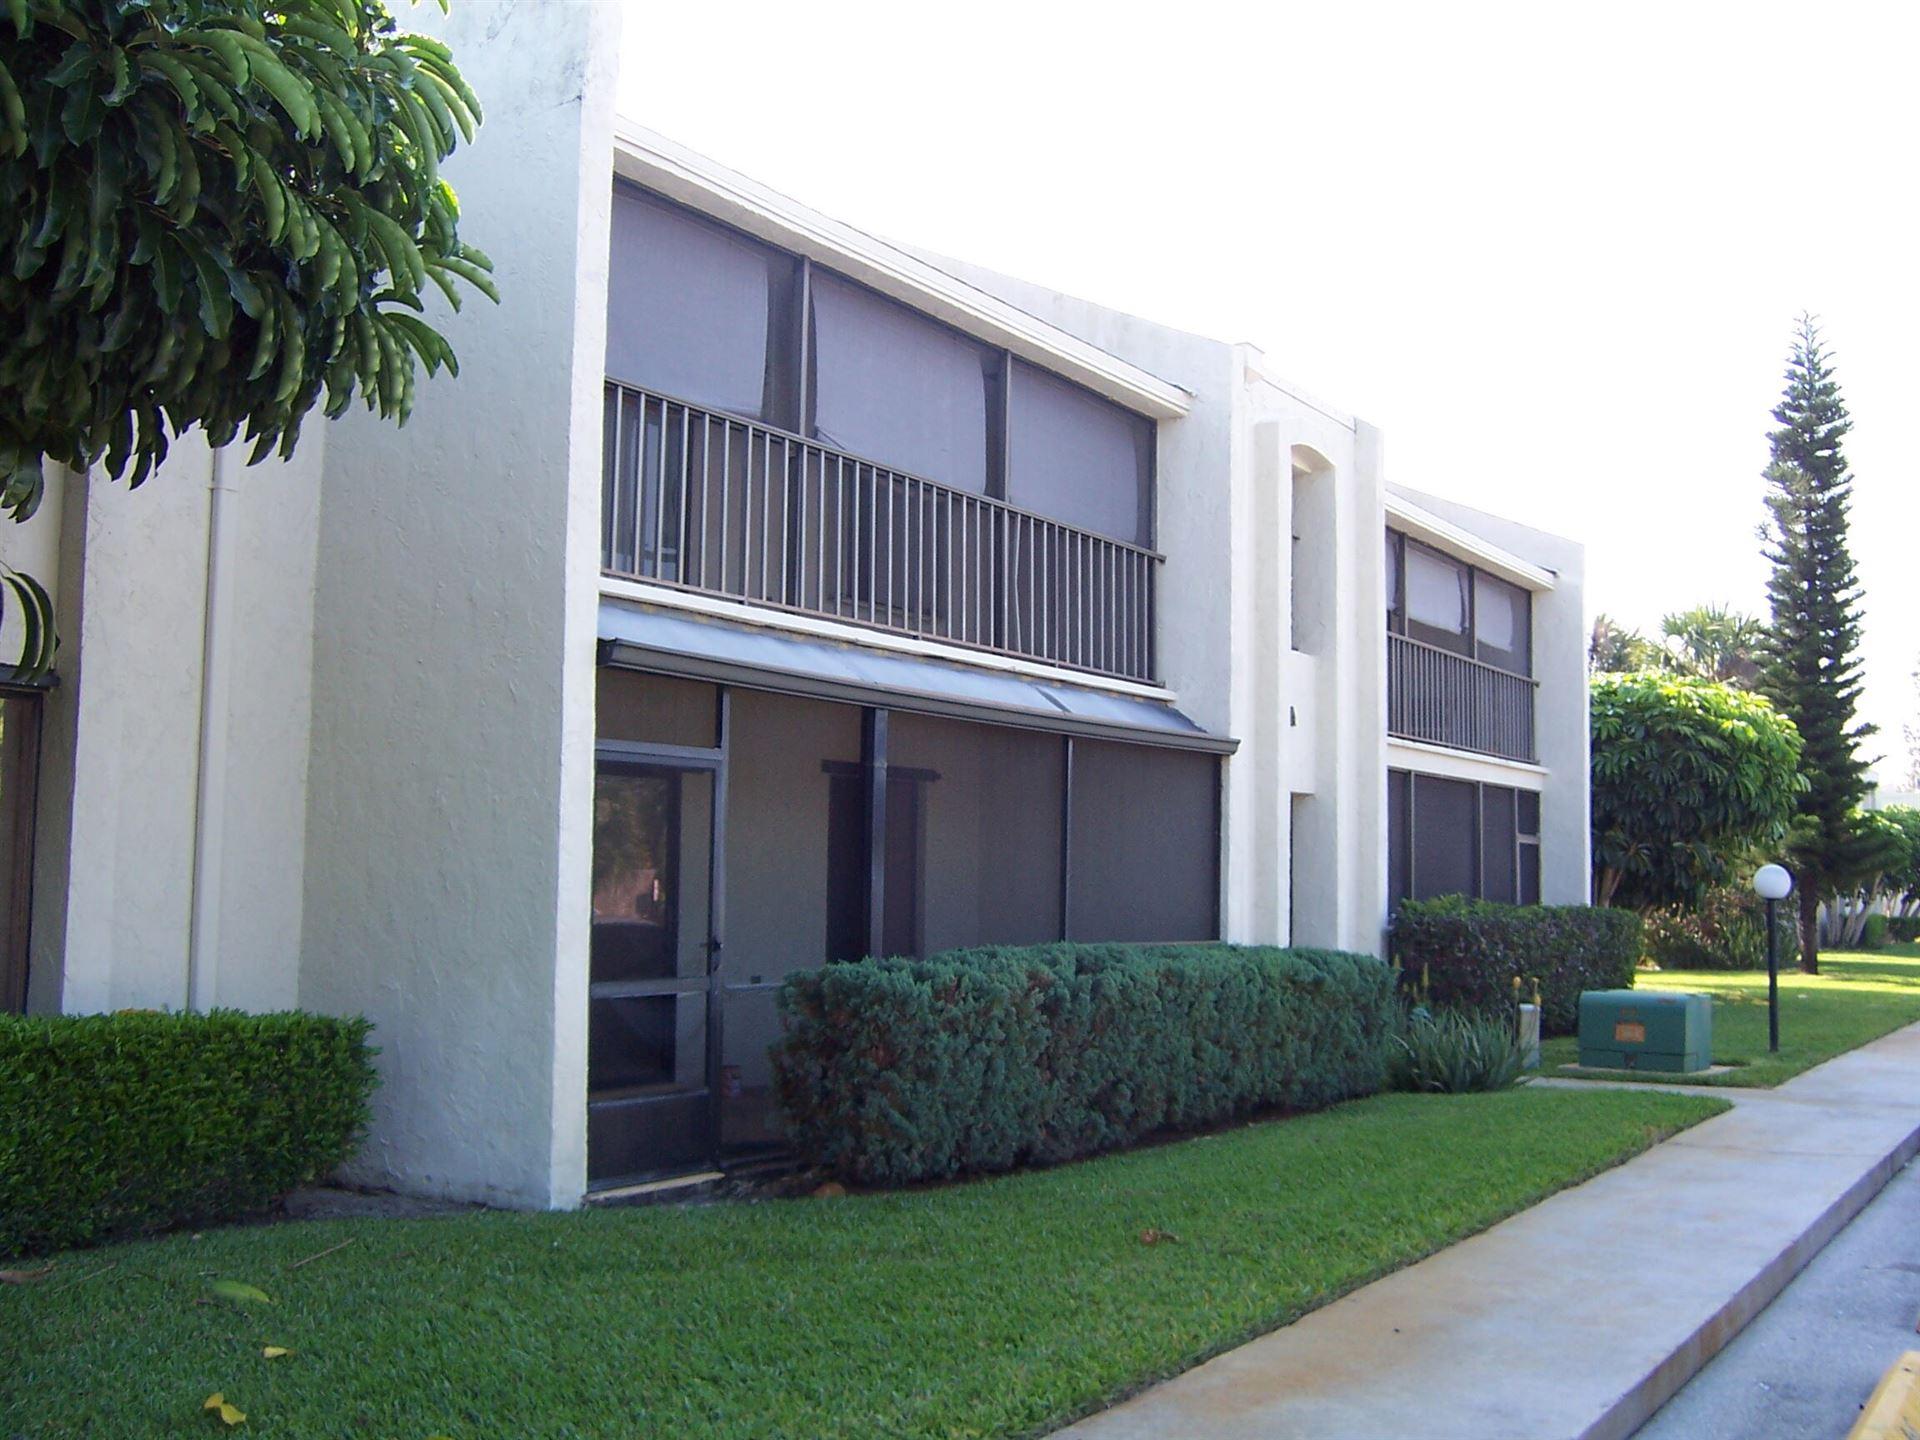 Photo of 150 Pineview Road #J-3, Tequesta, FL 33469 (MLS # RX-10744568)